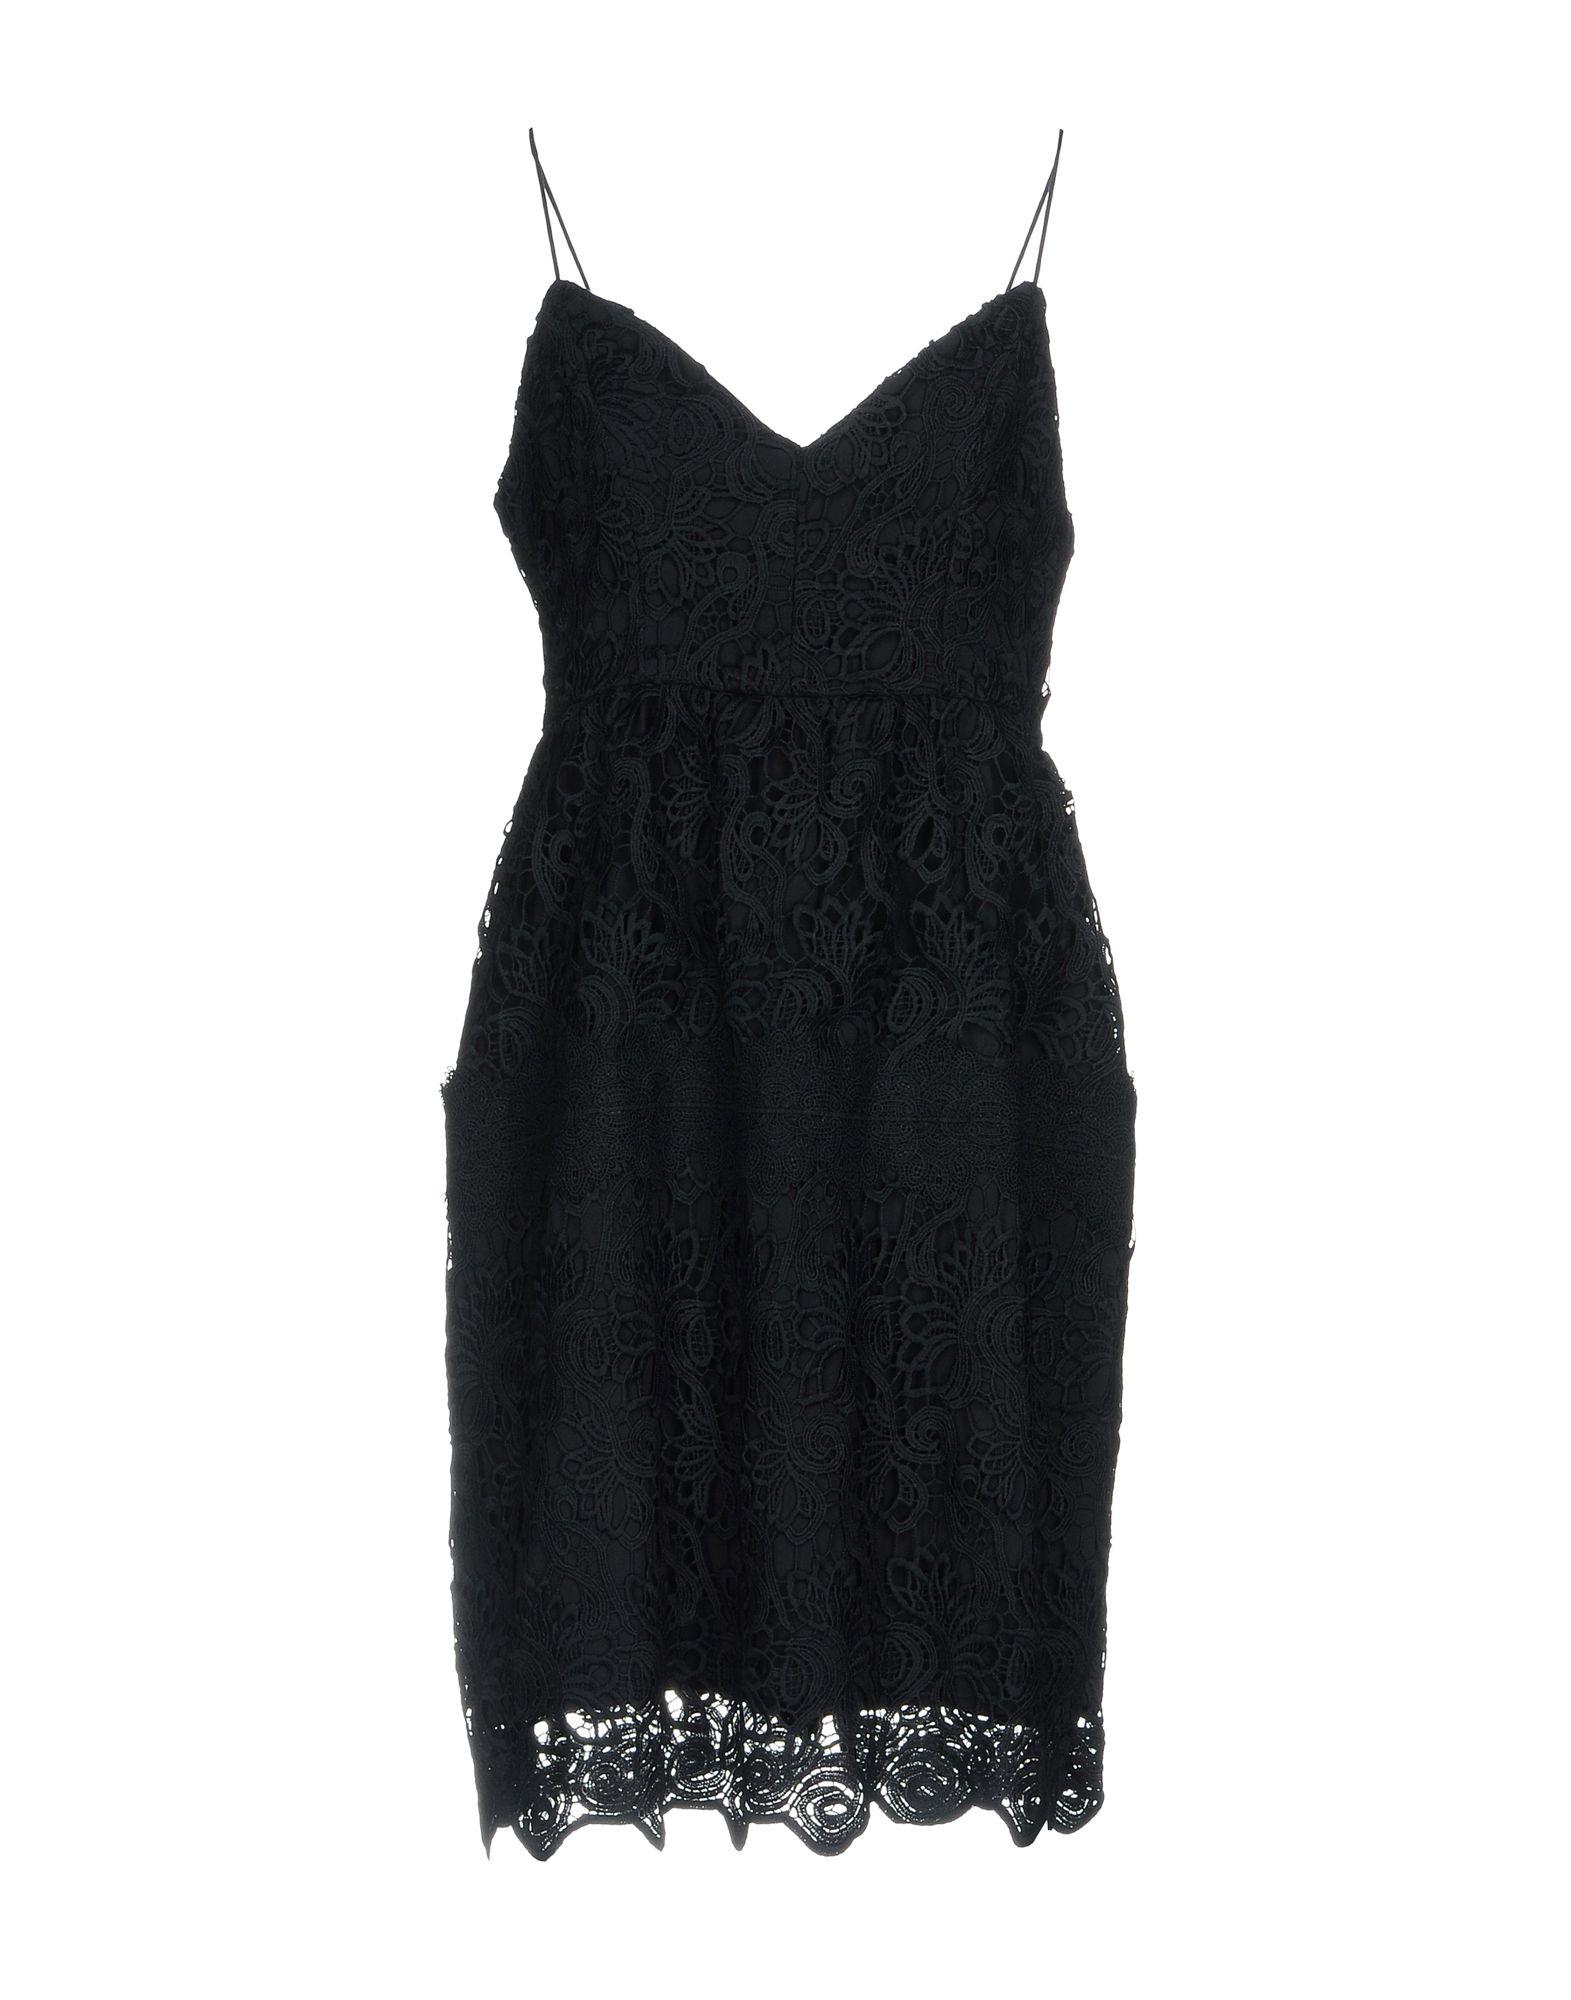 KOCCA Короткое платье платье розовое billieblush ут 00011545 page 4